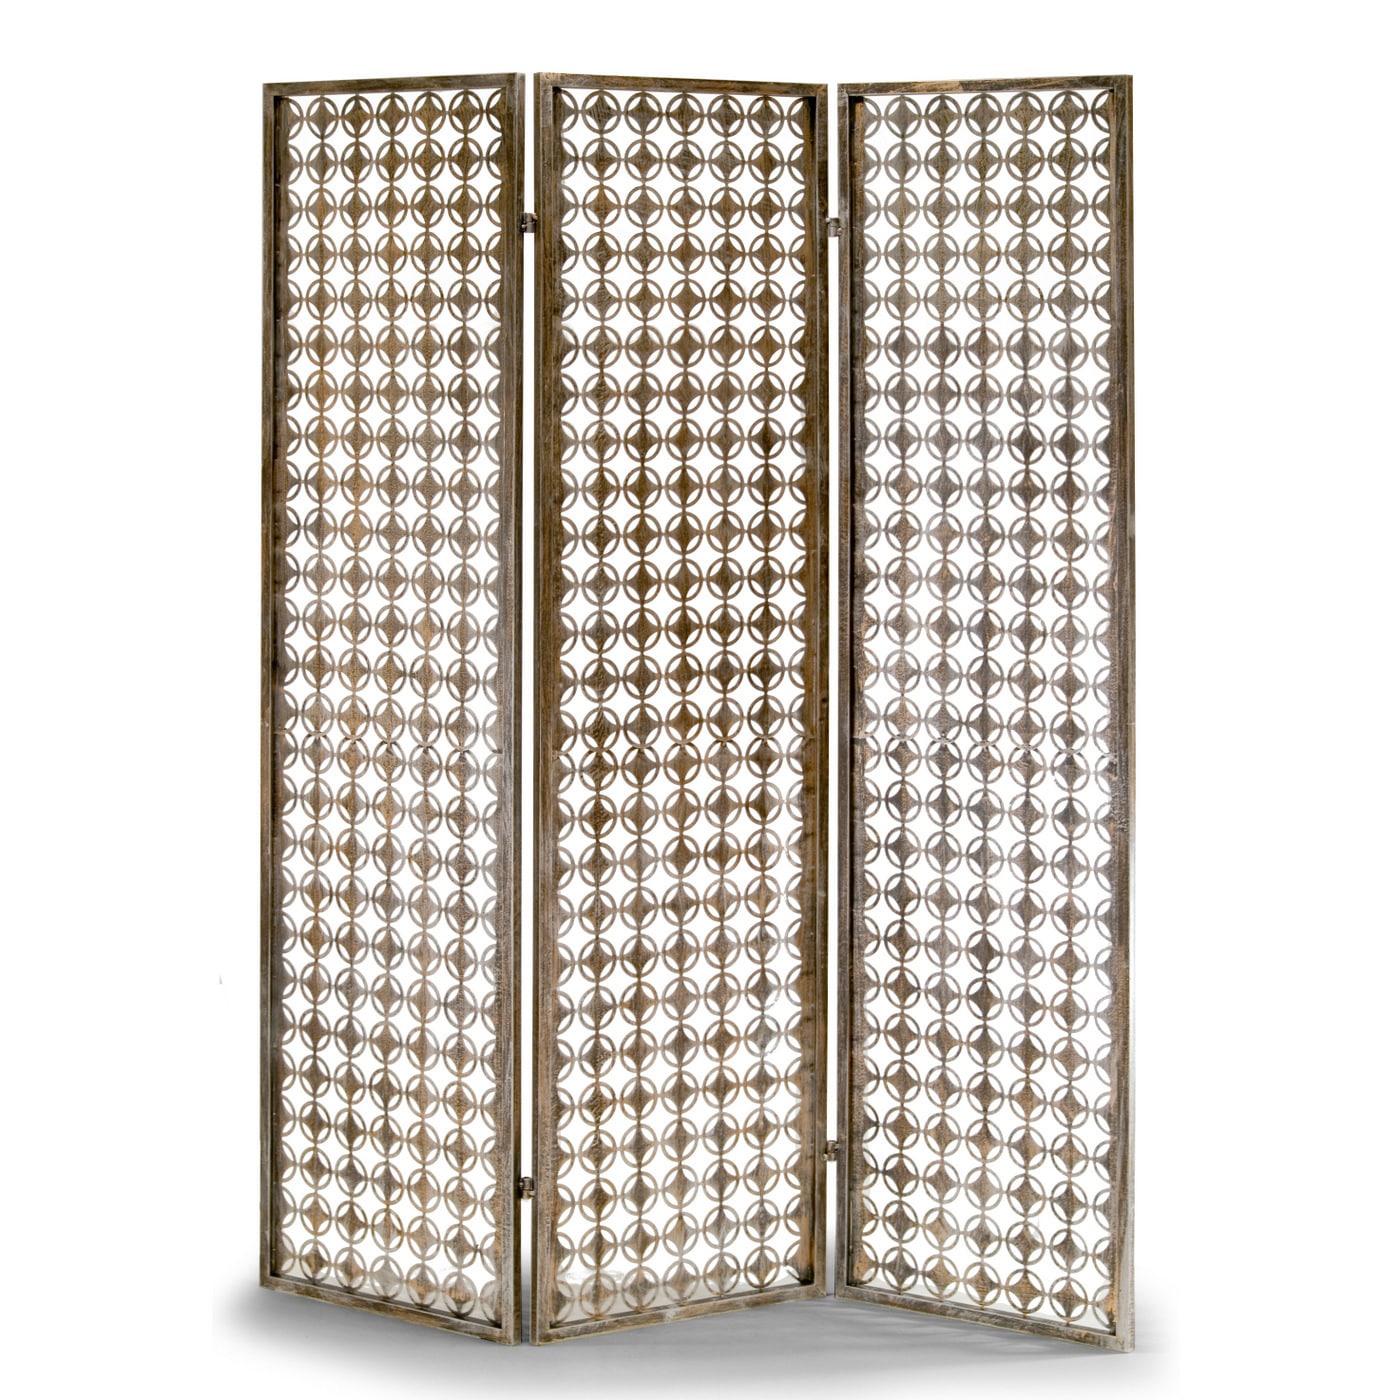 Glamour Abbey Three-panel Metal Folding Screen Antique-st...